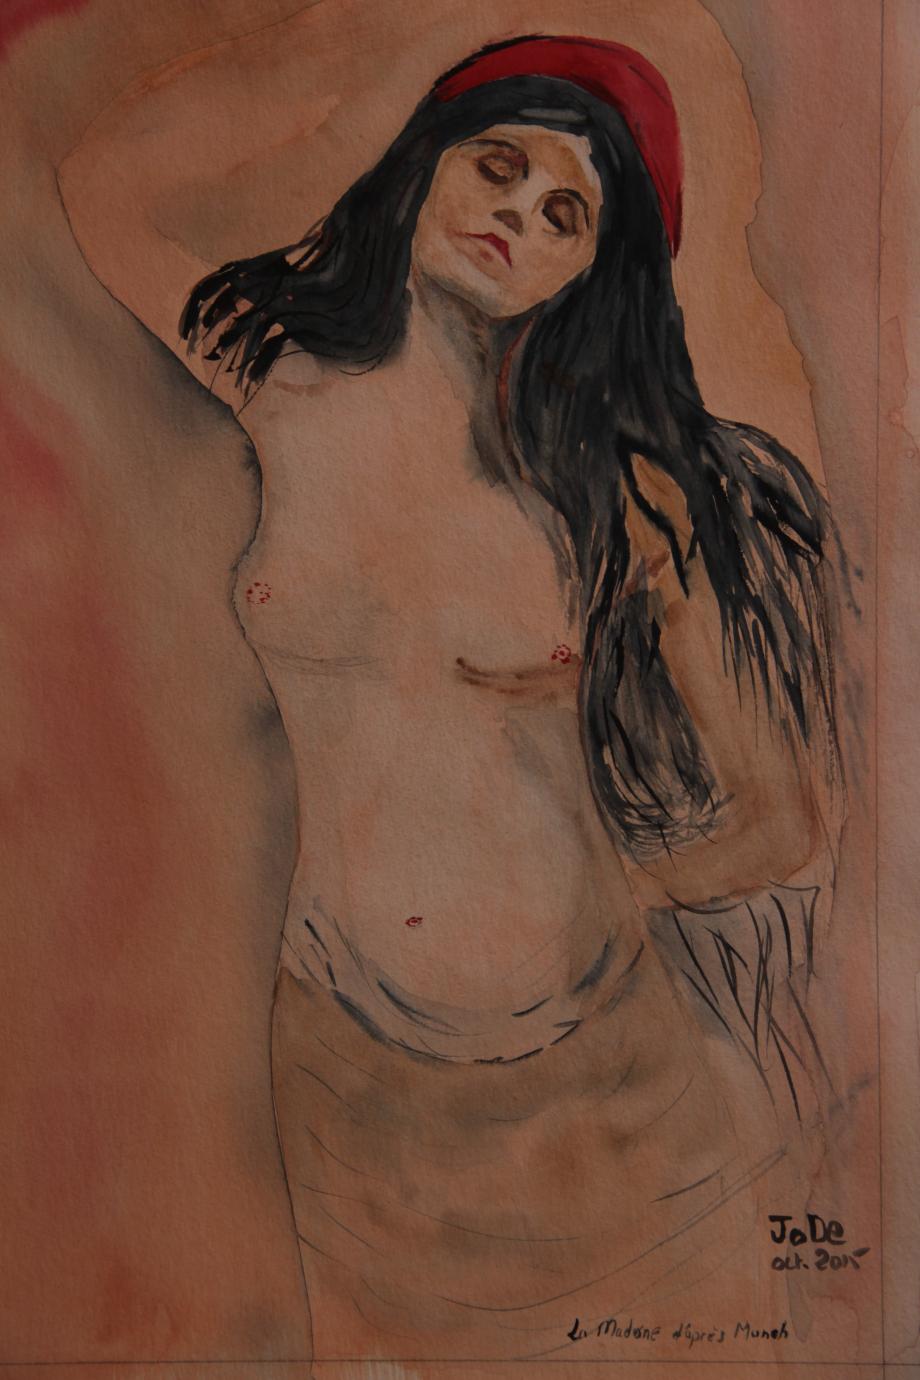 La madone d'après Munch.JPG